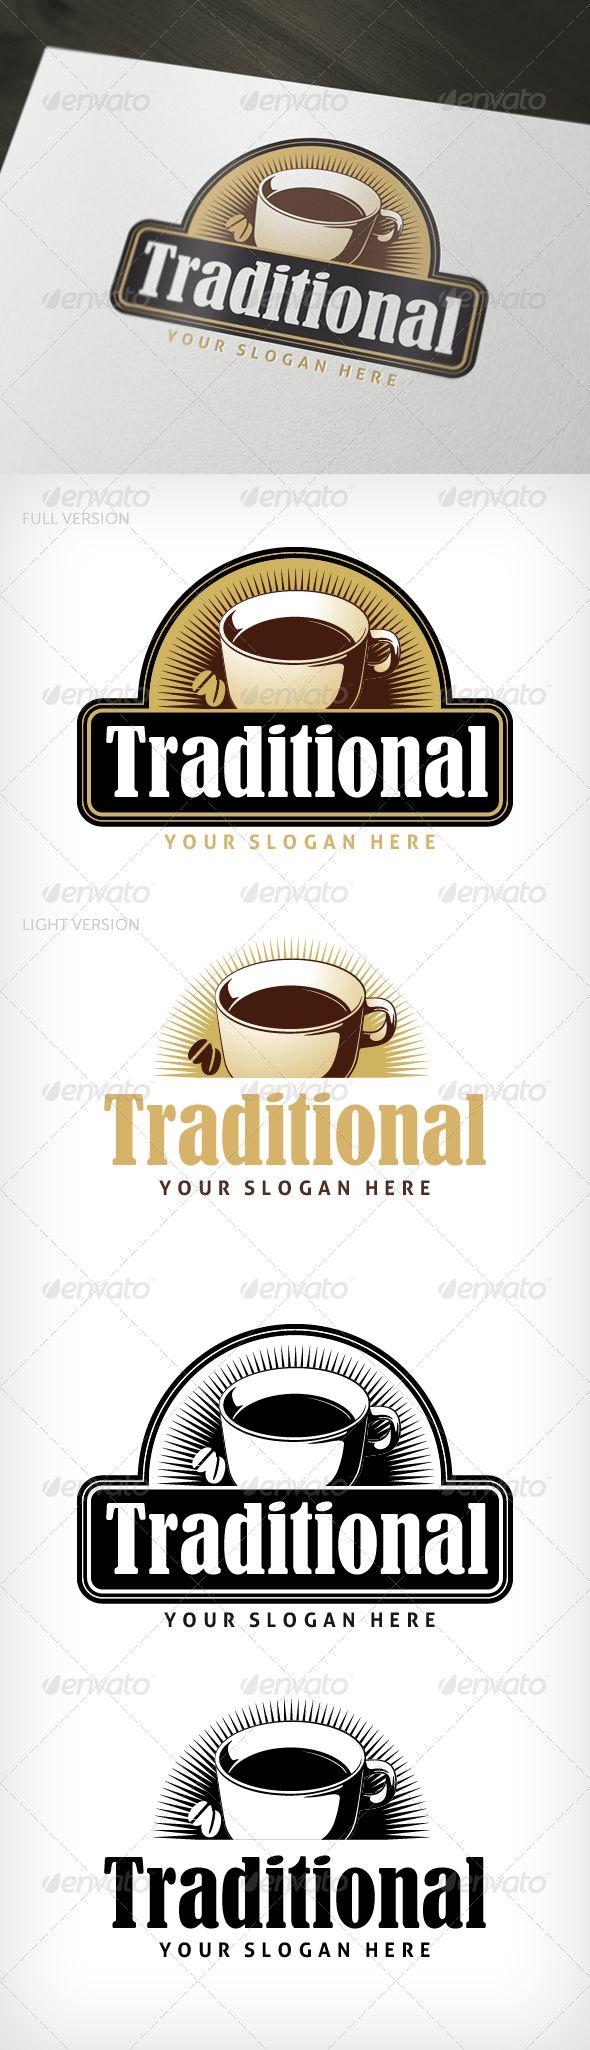 1000 ideias sobre Traditional Coffee And Tea no Pinterest.